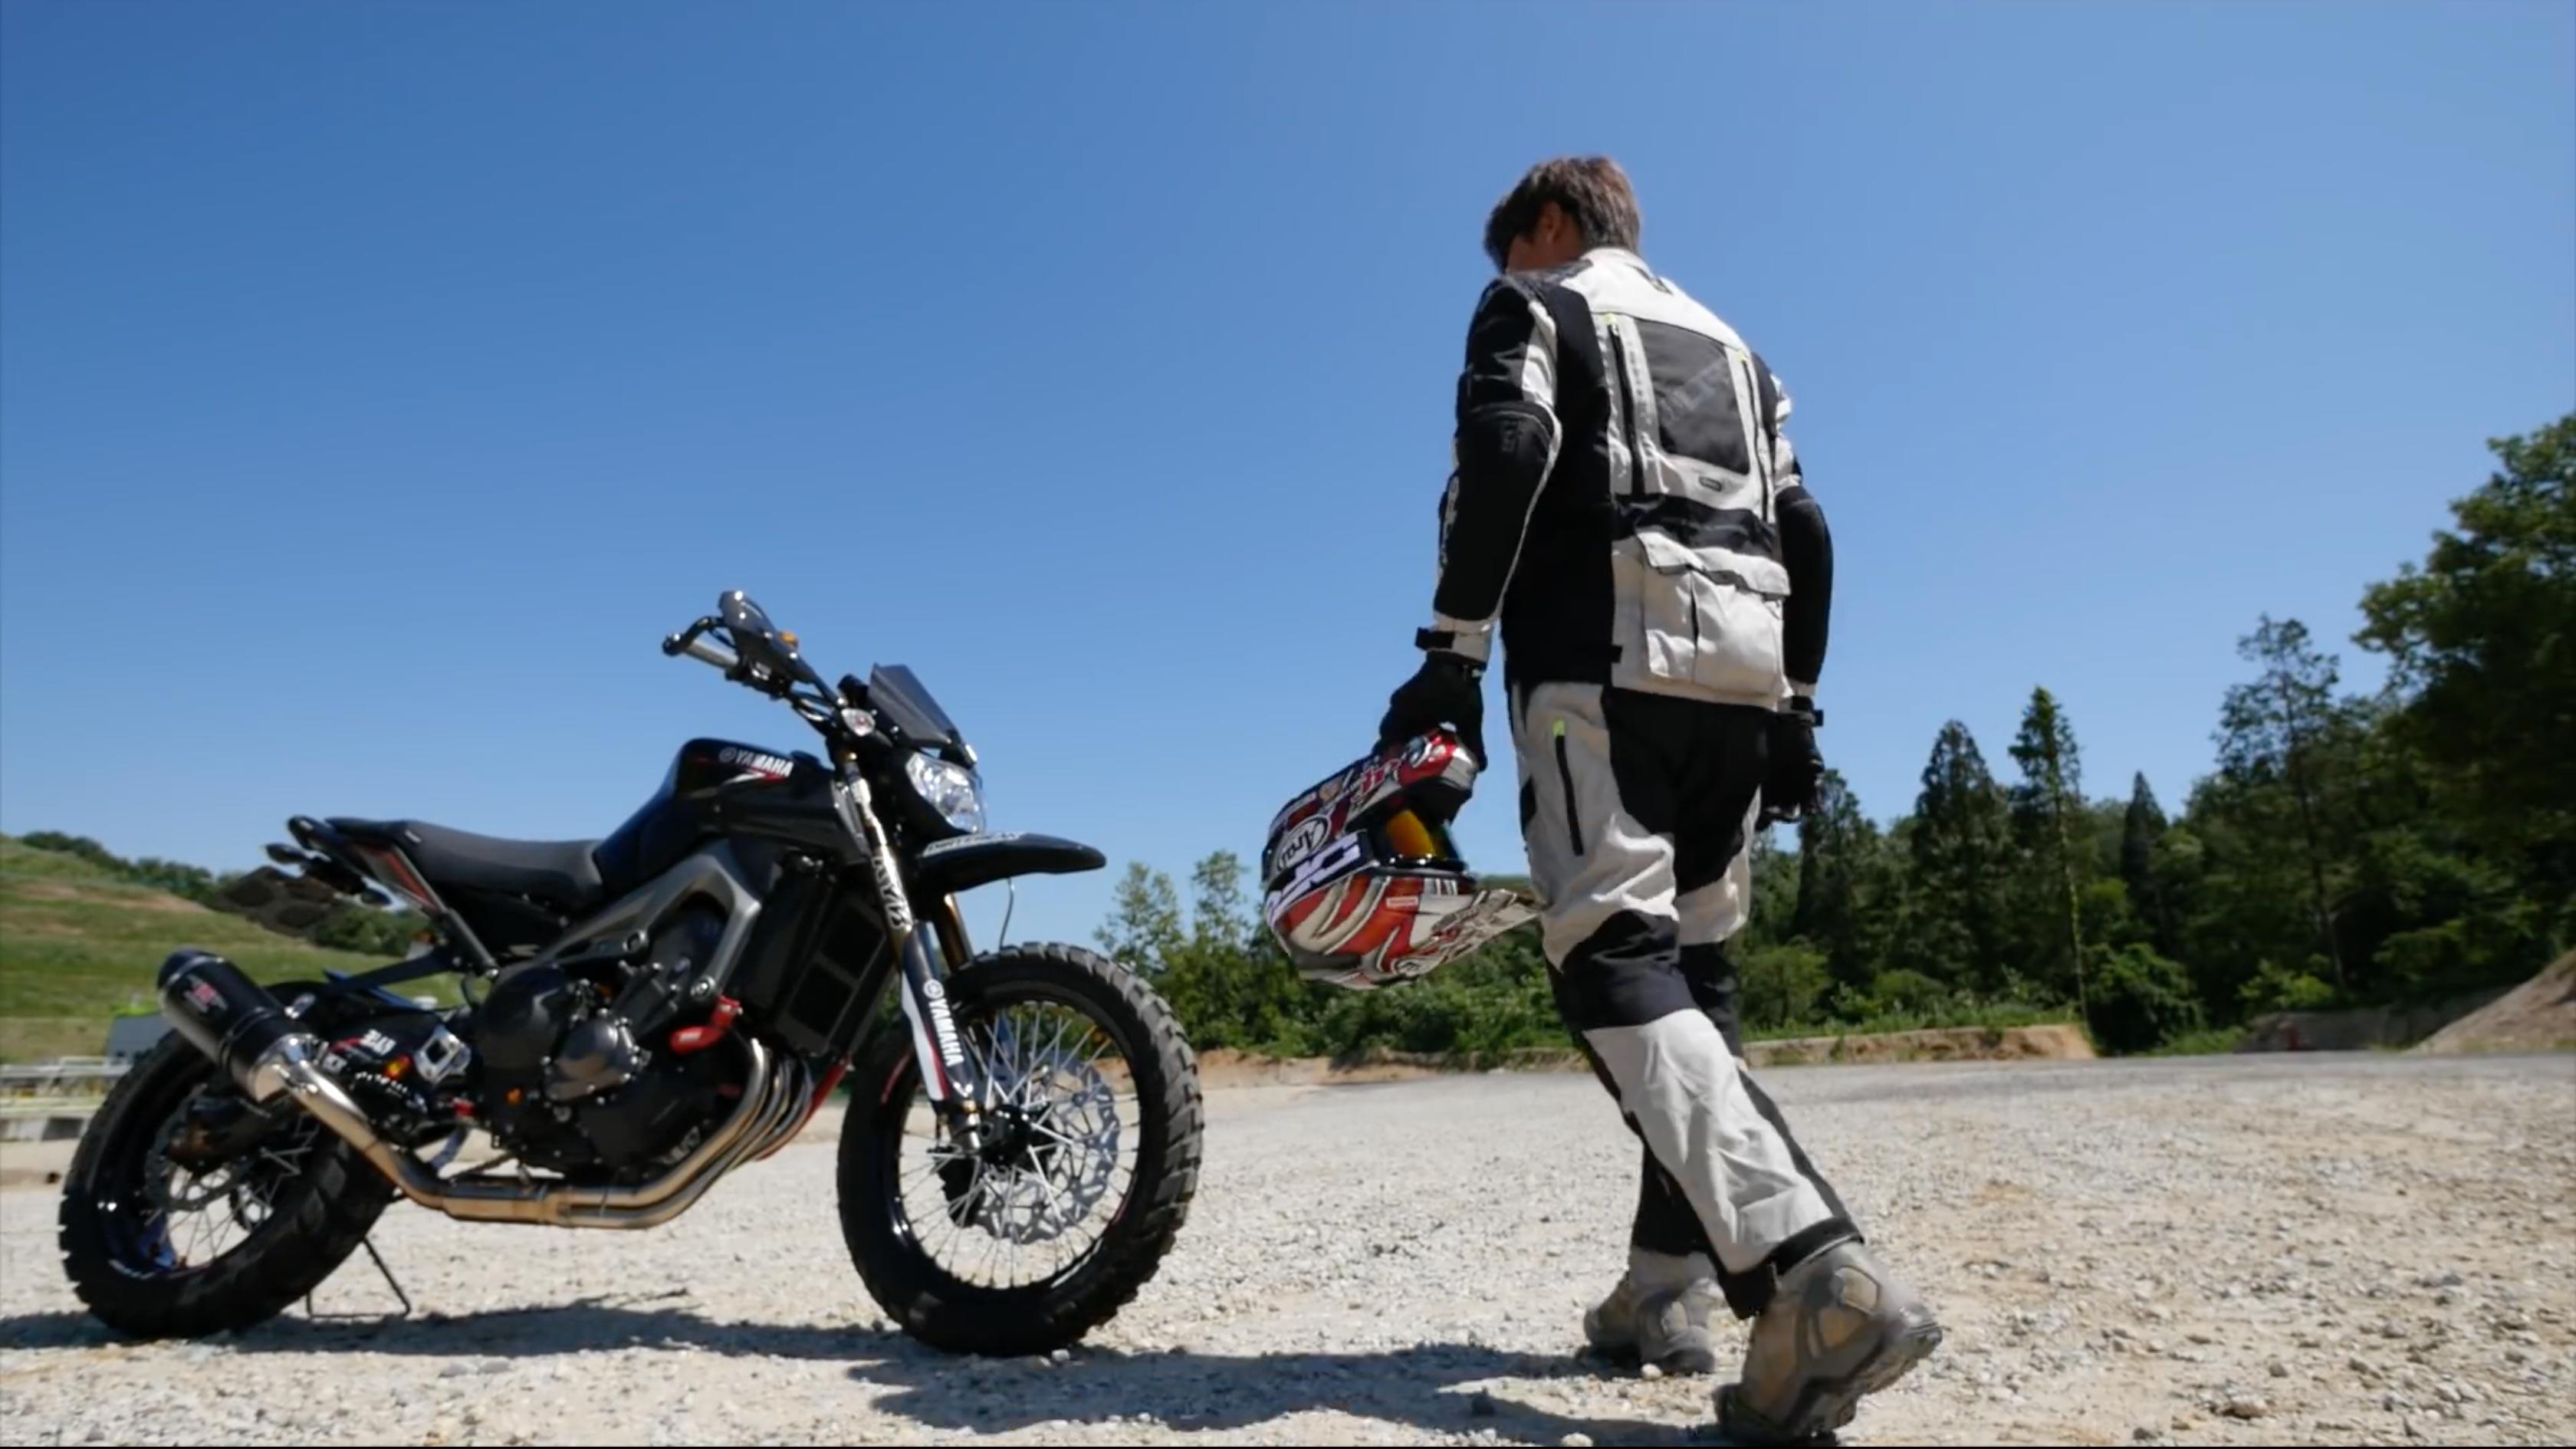 Yamaha-MT-FZ-10-Adventure-Tourer-ADV-custom-08.jpg